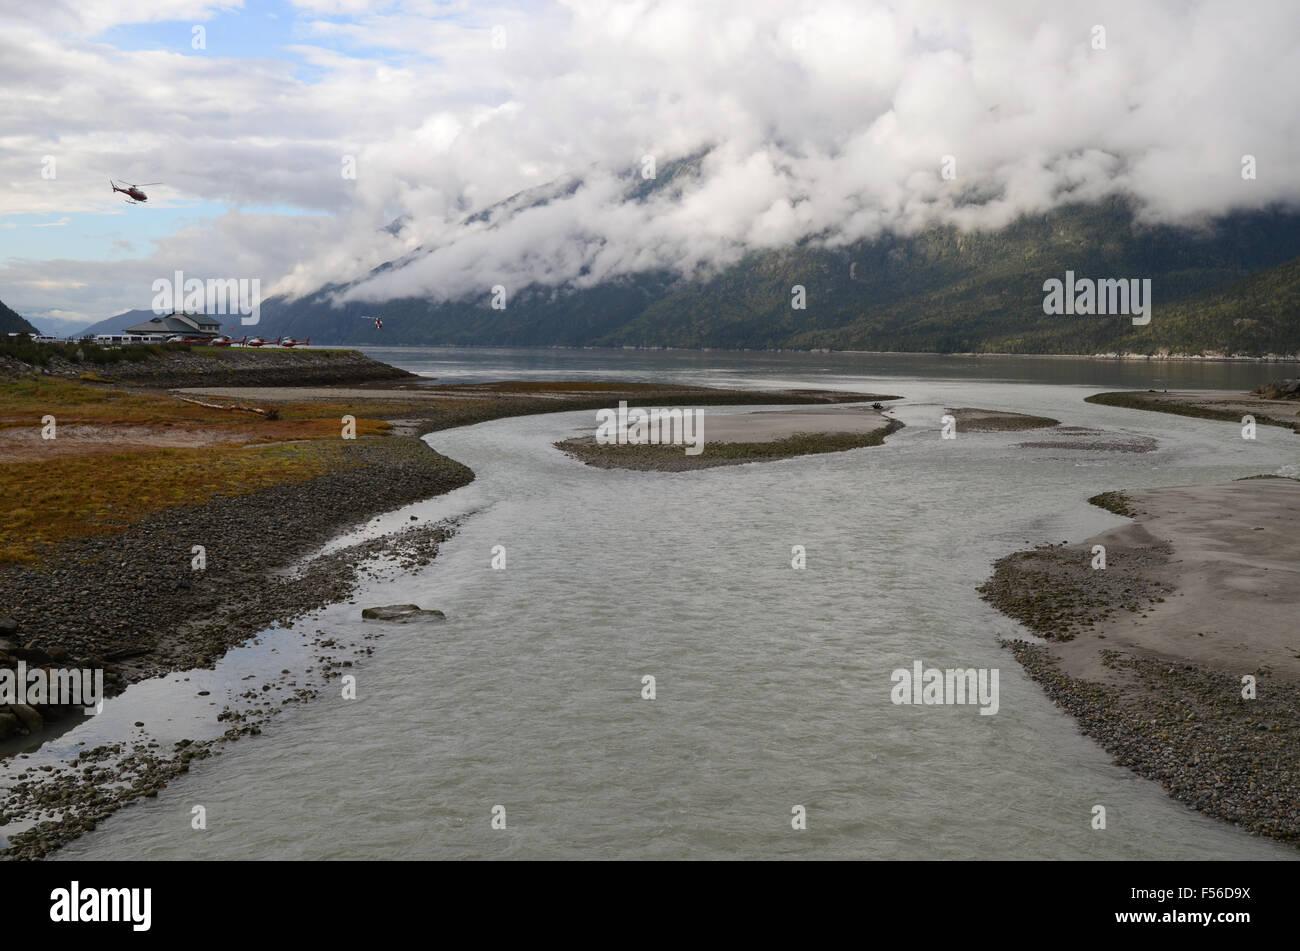 The Skagway River/Taiya Inlet, Skagway, Alaska - Stock Image